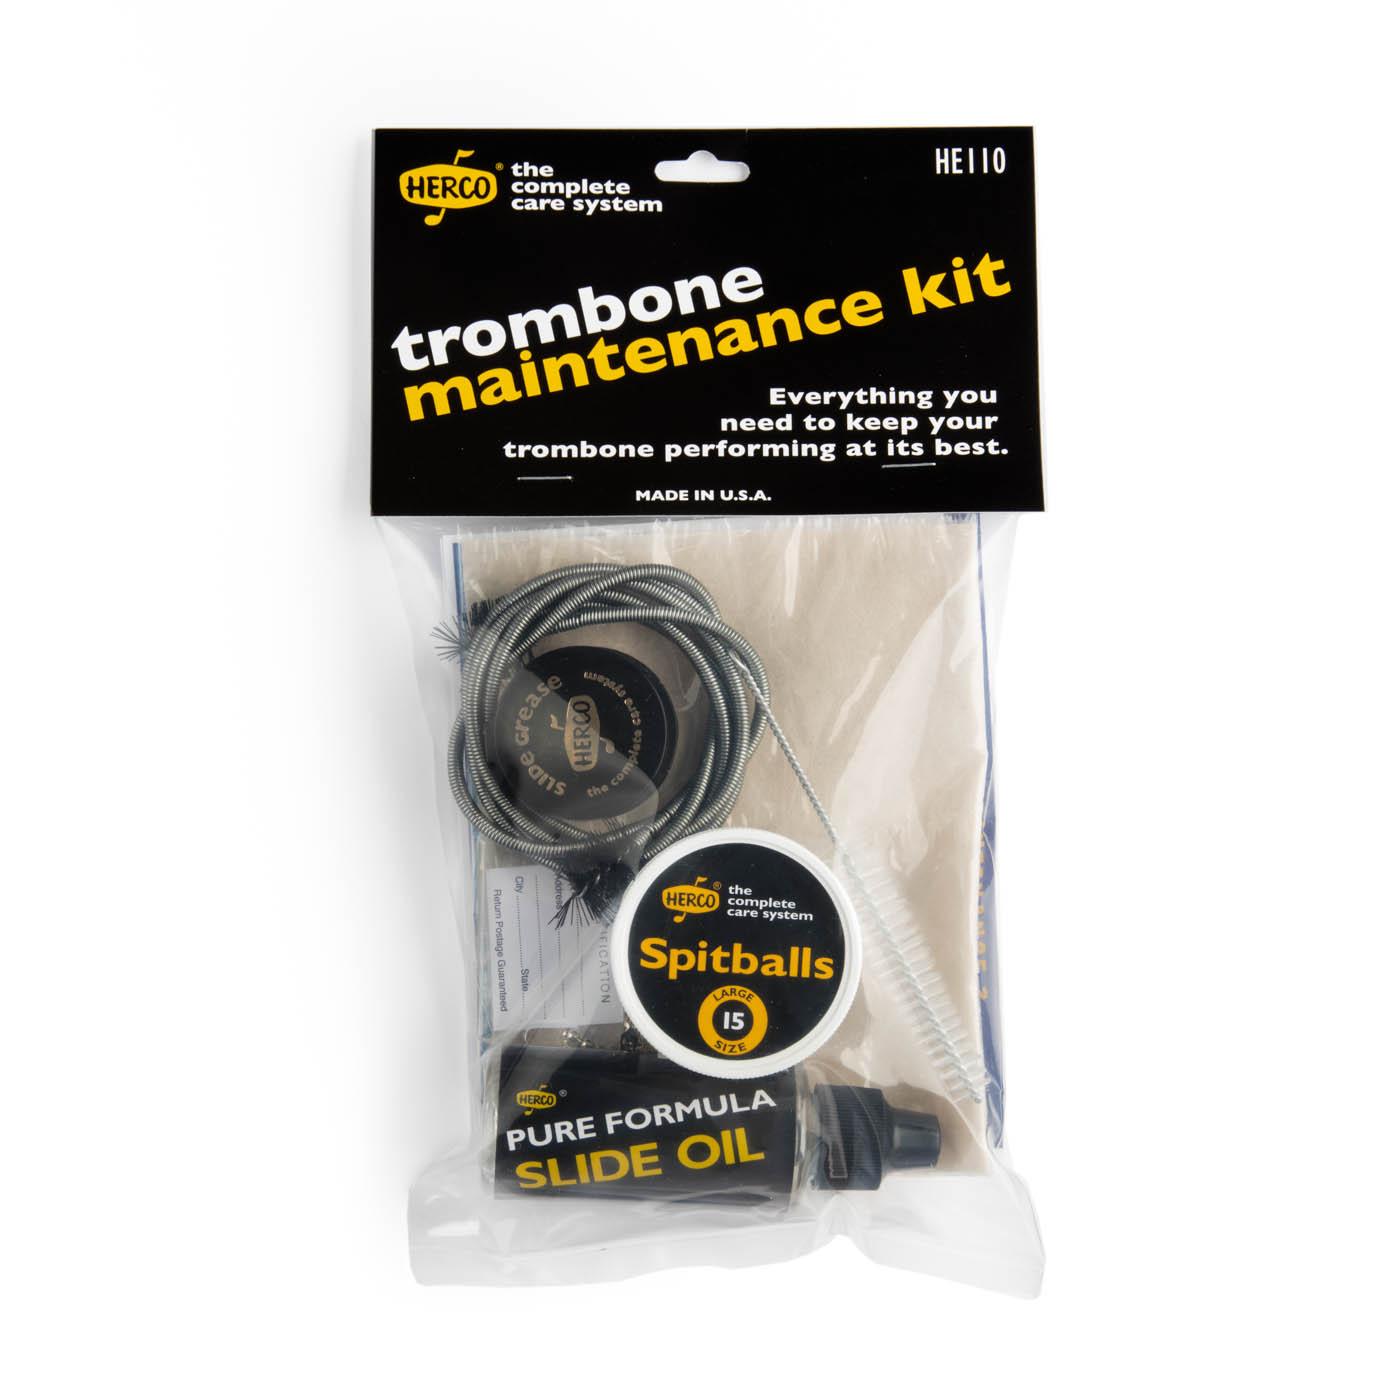 Herco HE110 Trombone Maintenance Kit